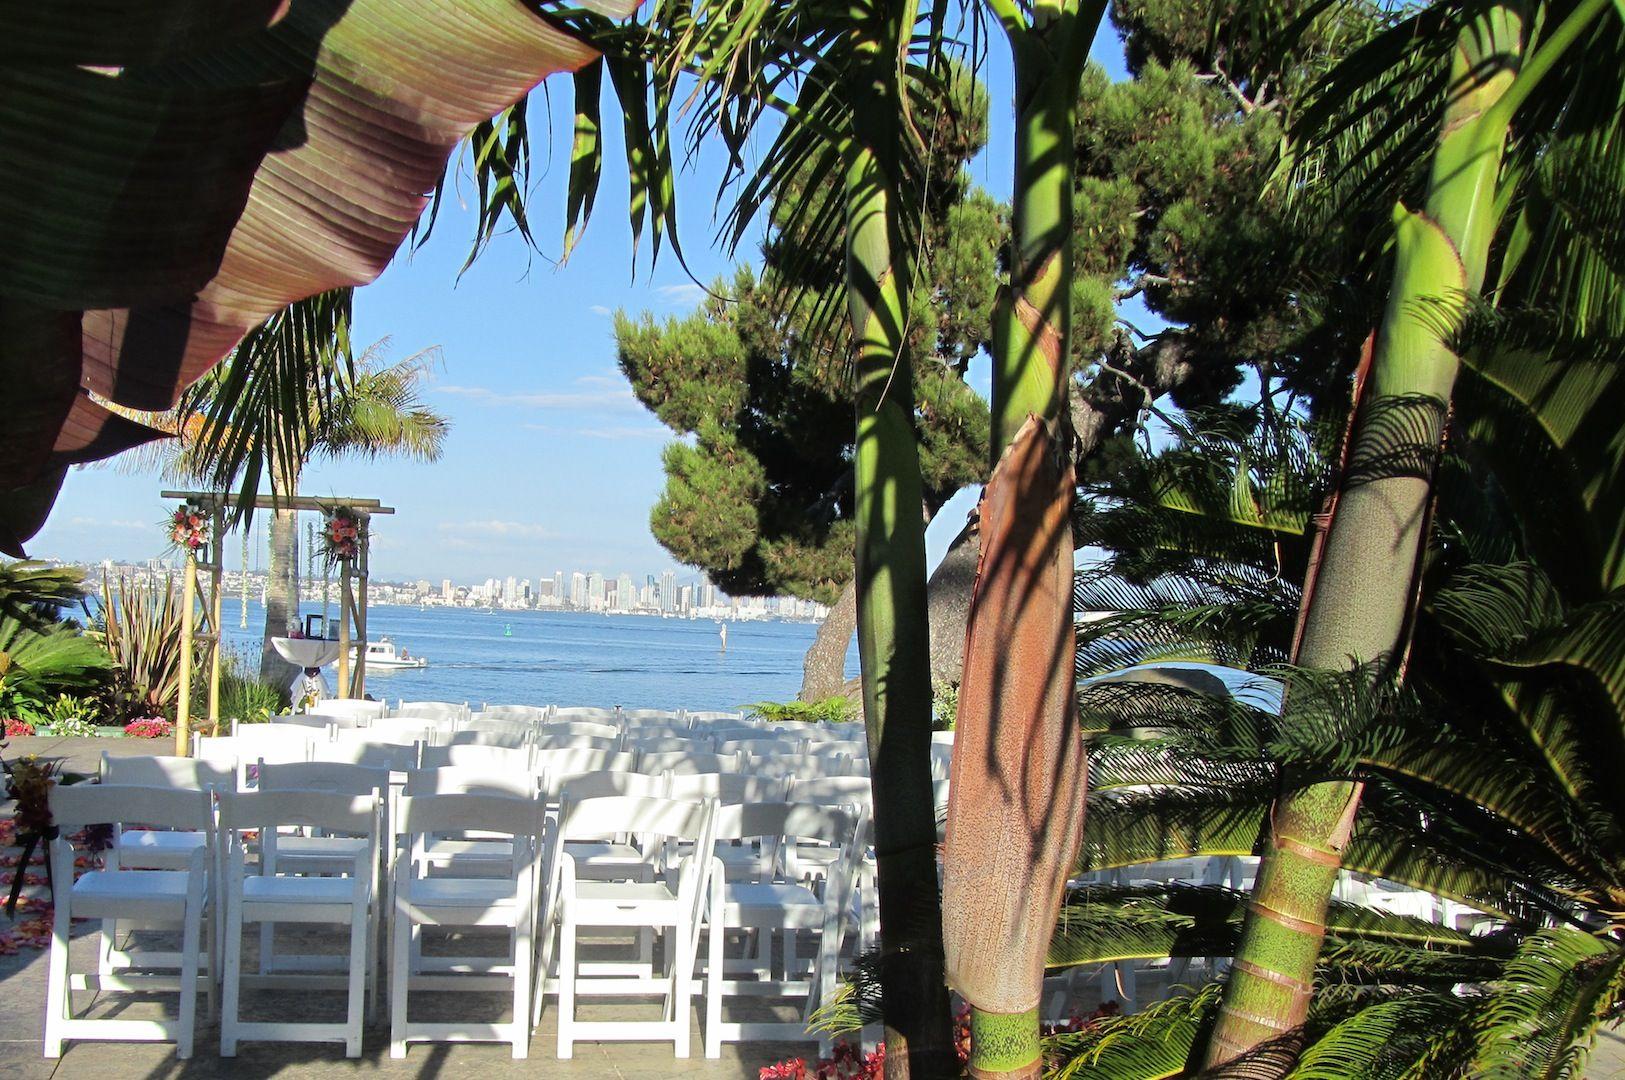 Bali Hai Restaurant on Shelter Island - San Diego, CA. This was my ...